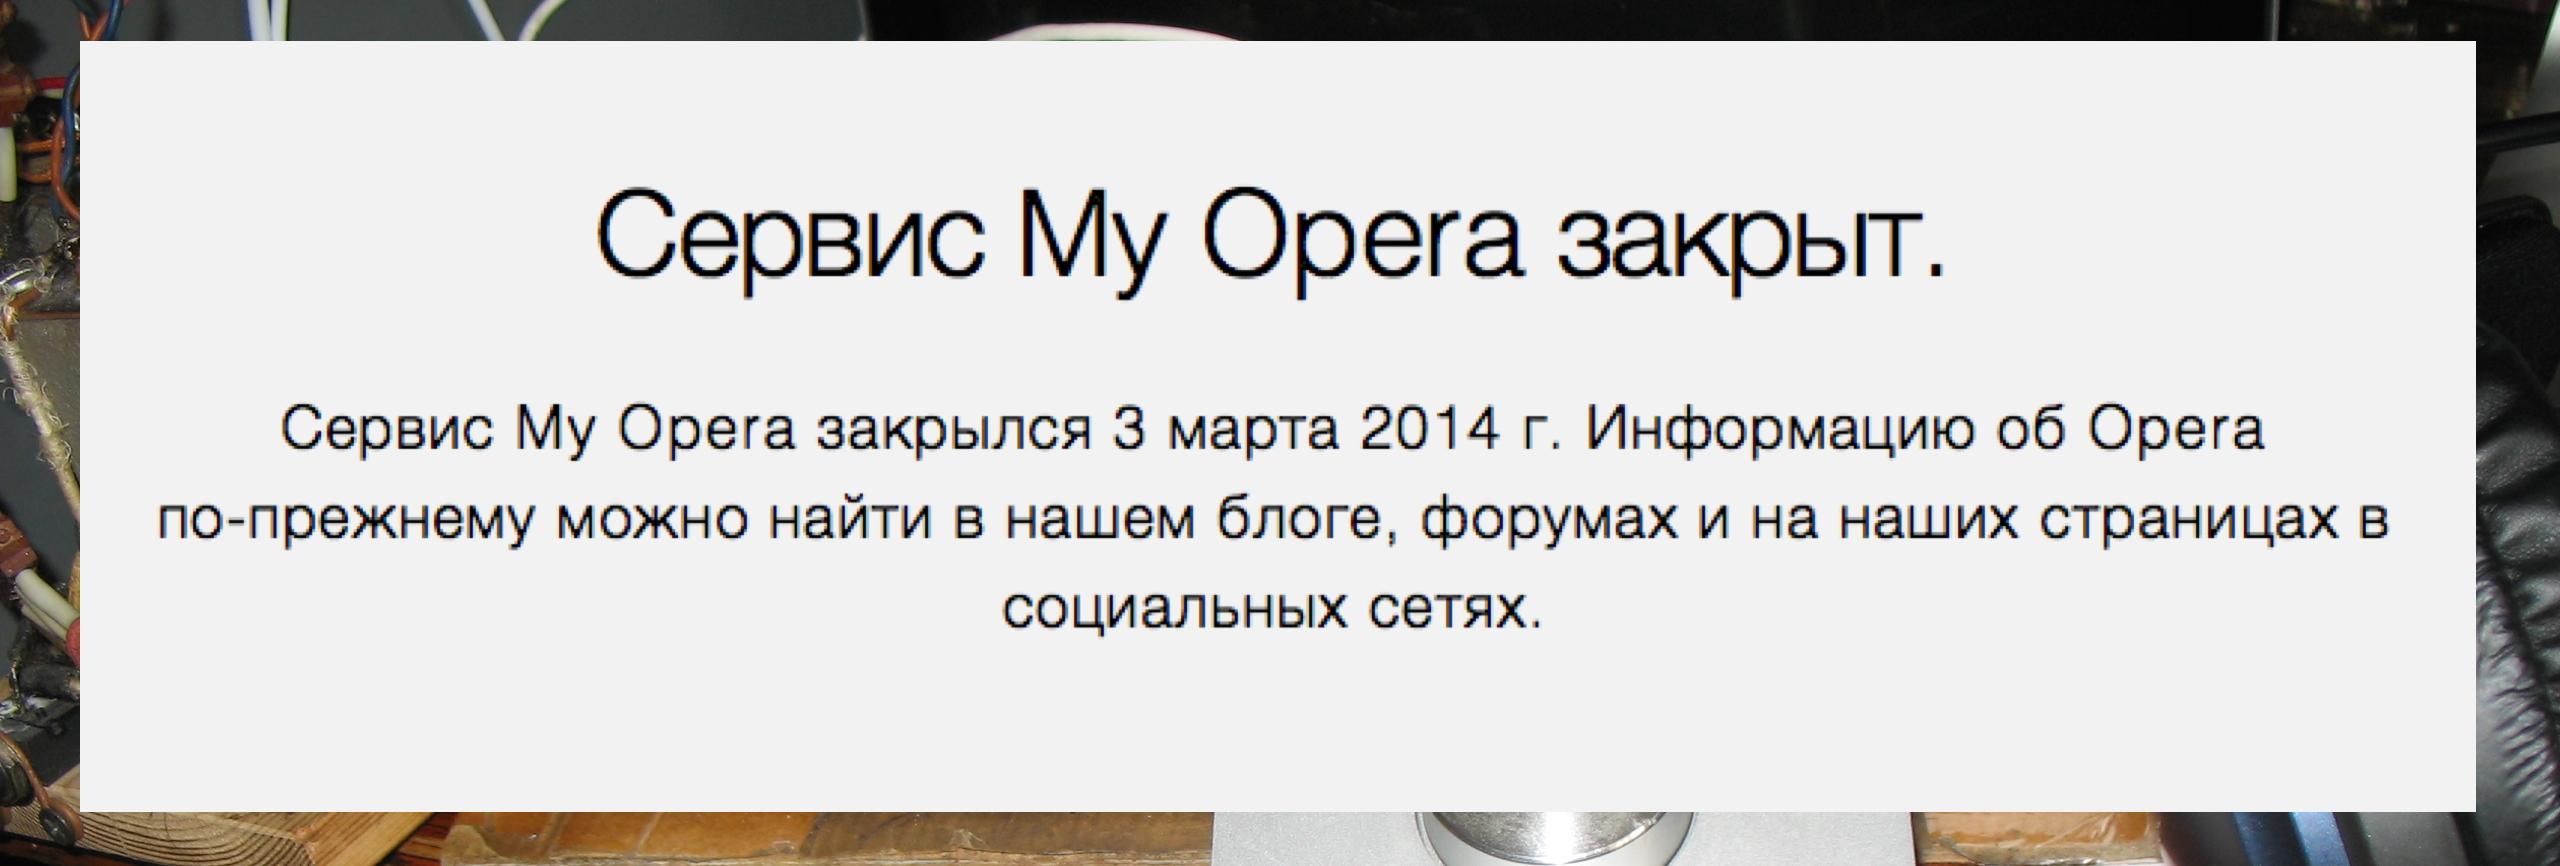 http://se.uploads.ru/sPUQ6.jpg